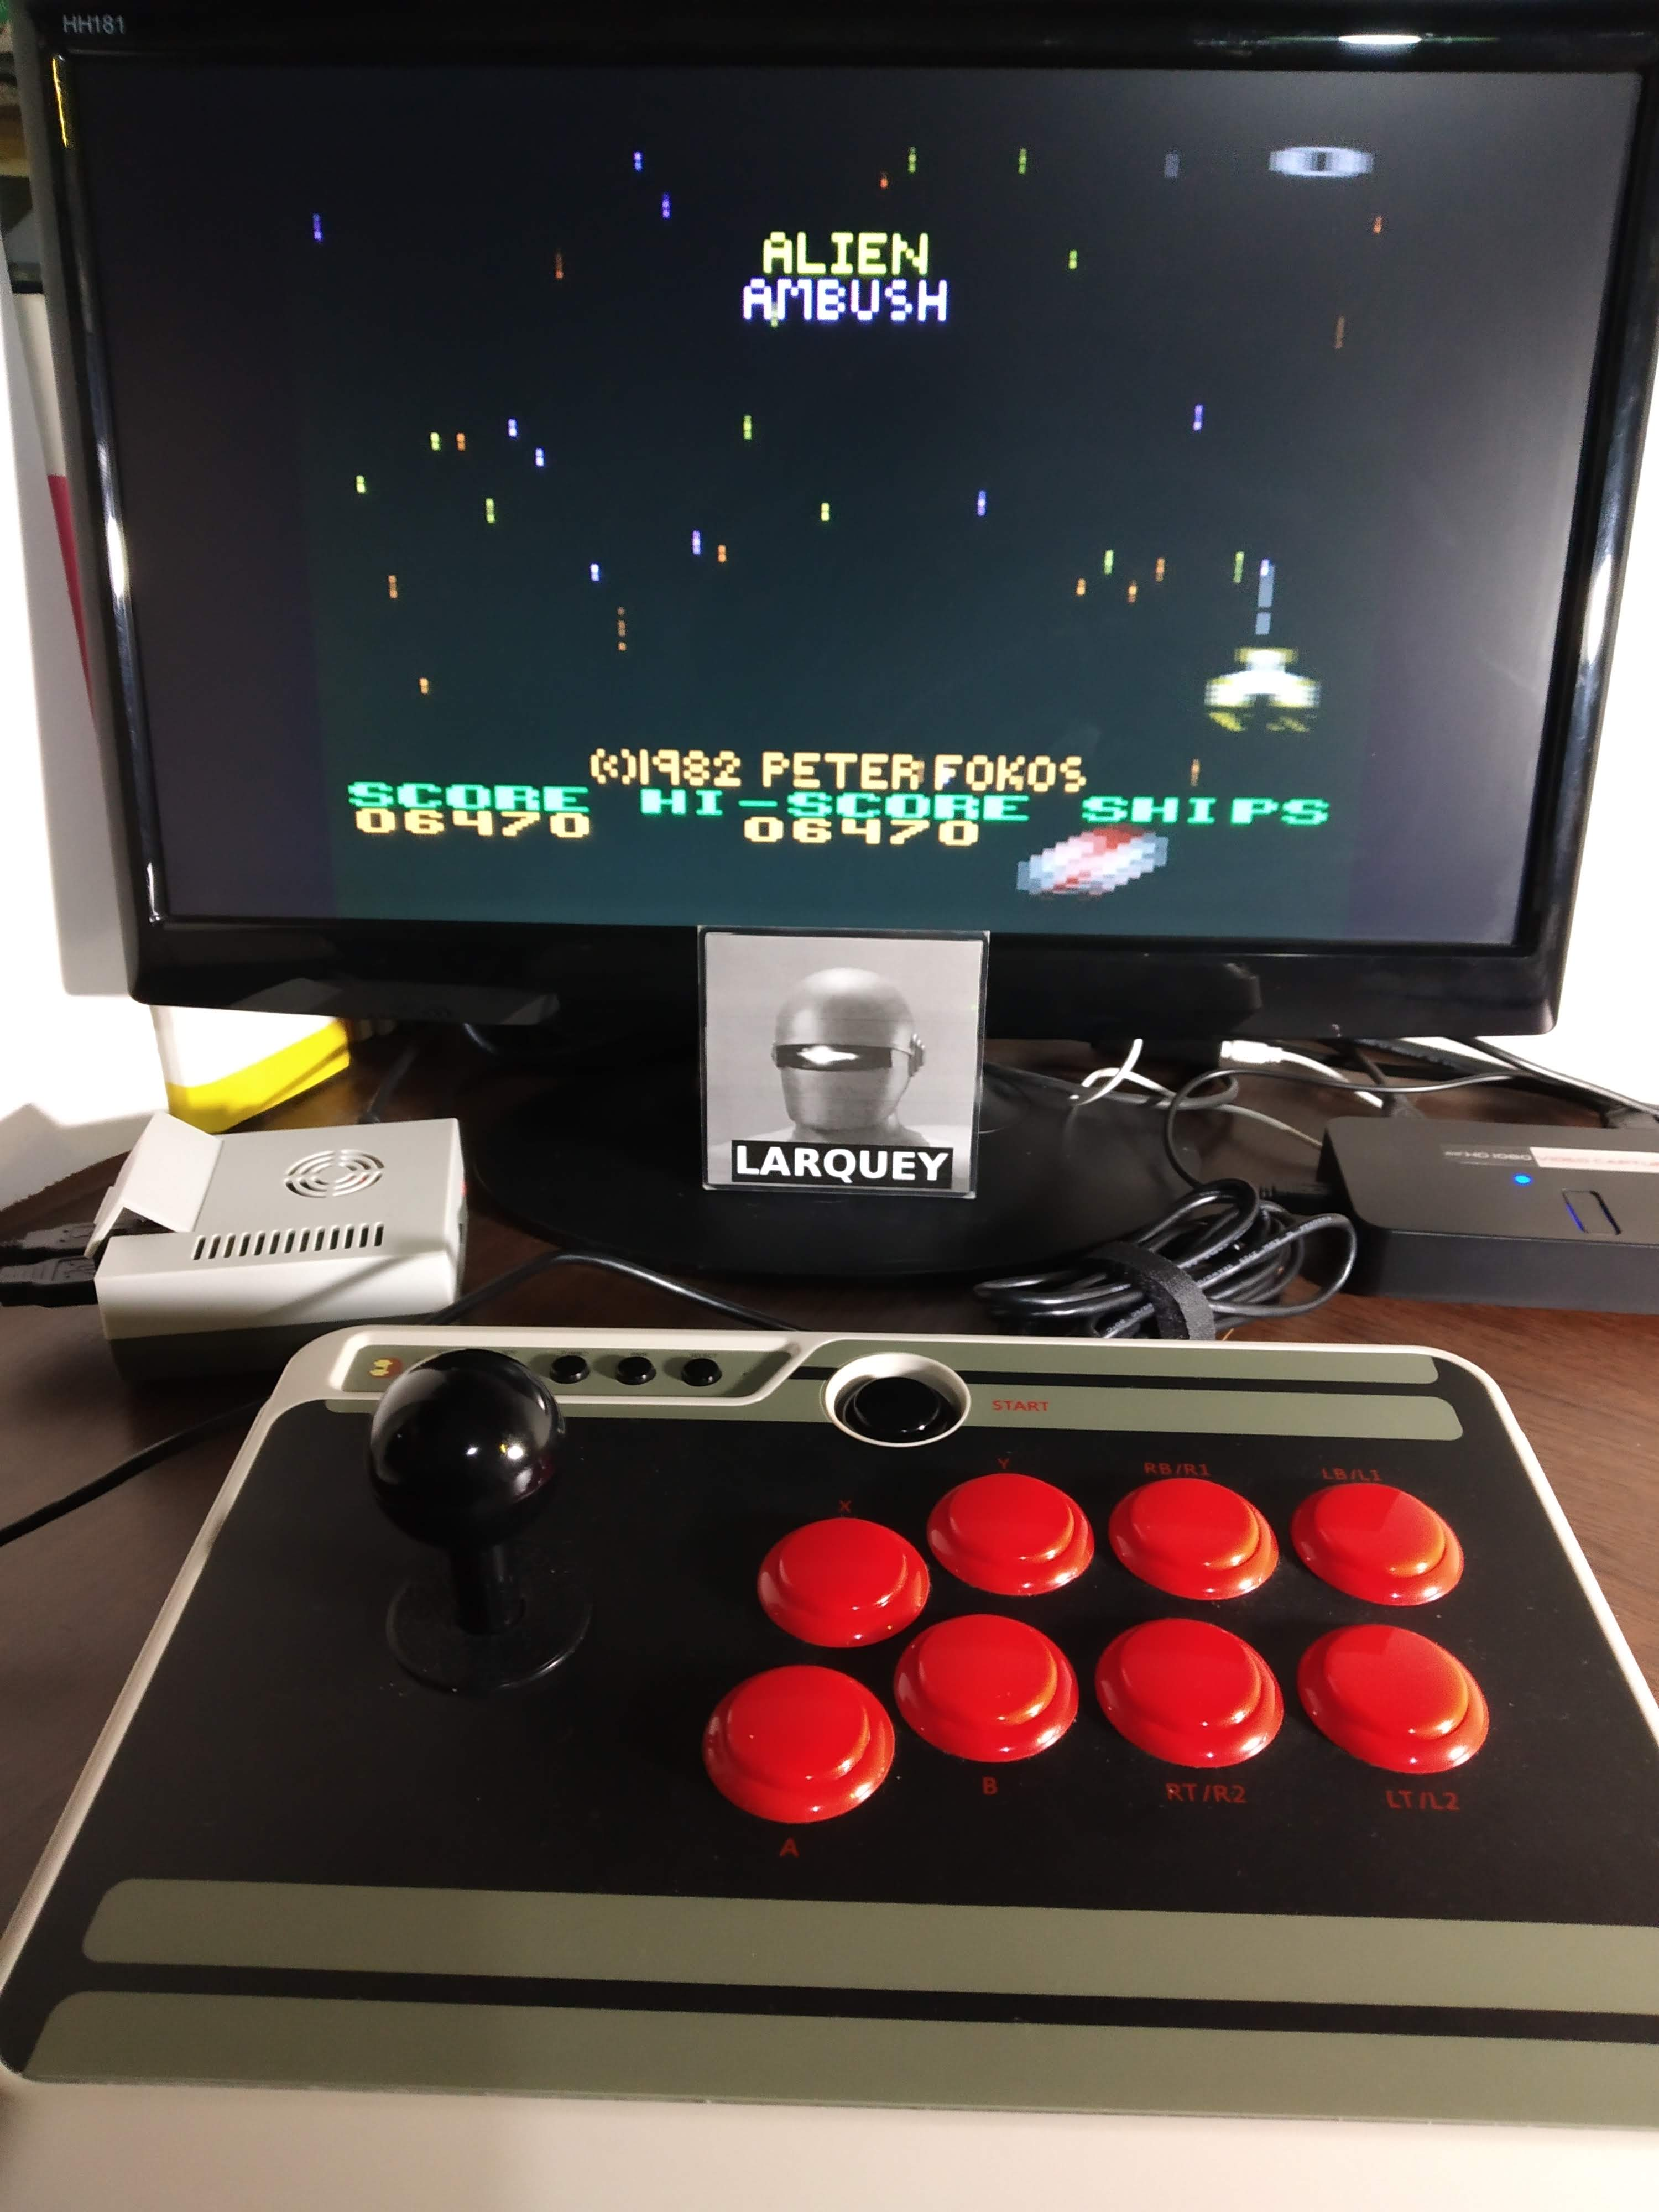 Larquey: Alien Ambush (Atari 400/800/XL/XE Emulated) 6,470 points on 2019-11-18 15:52:56